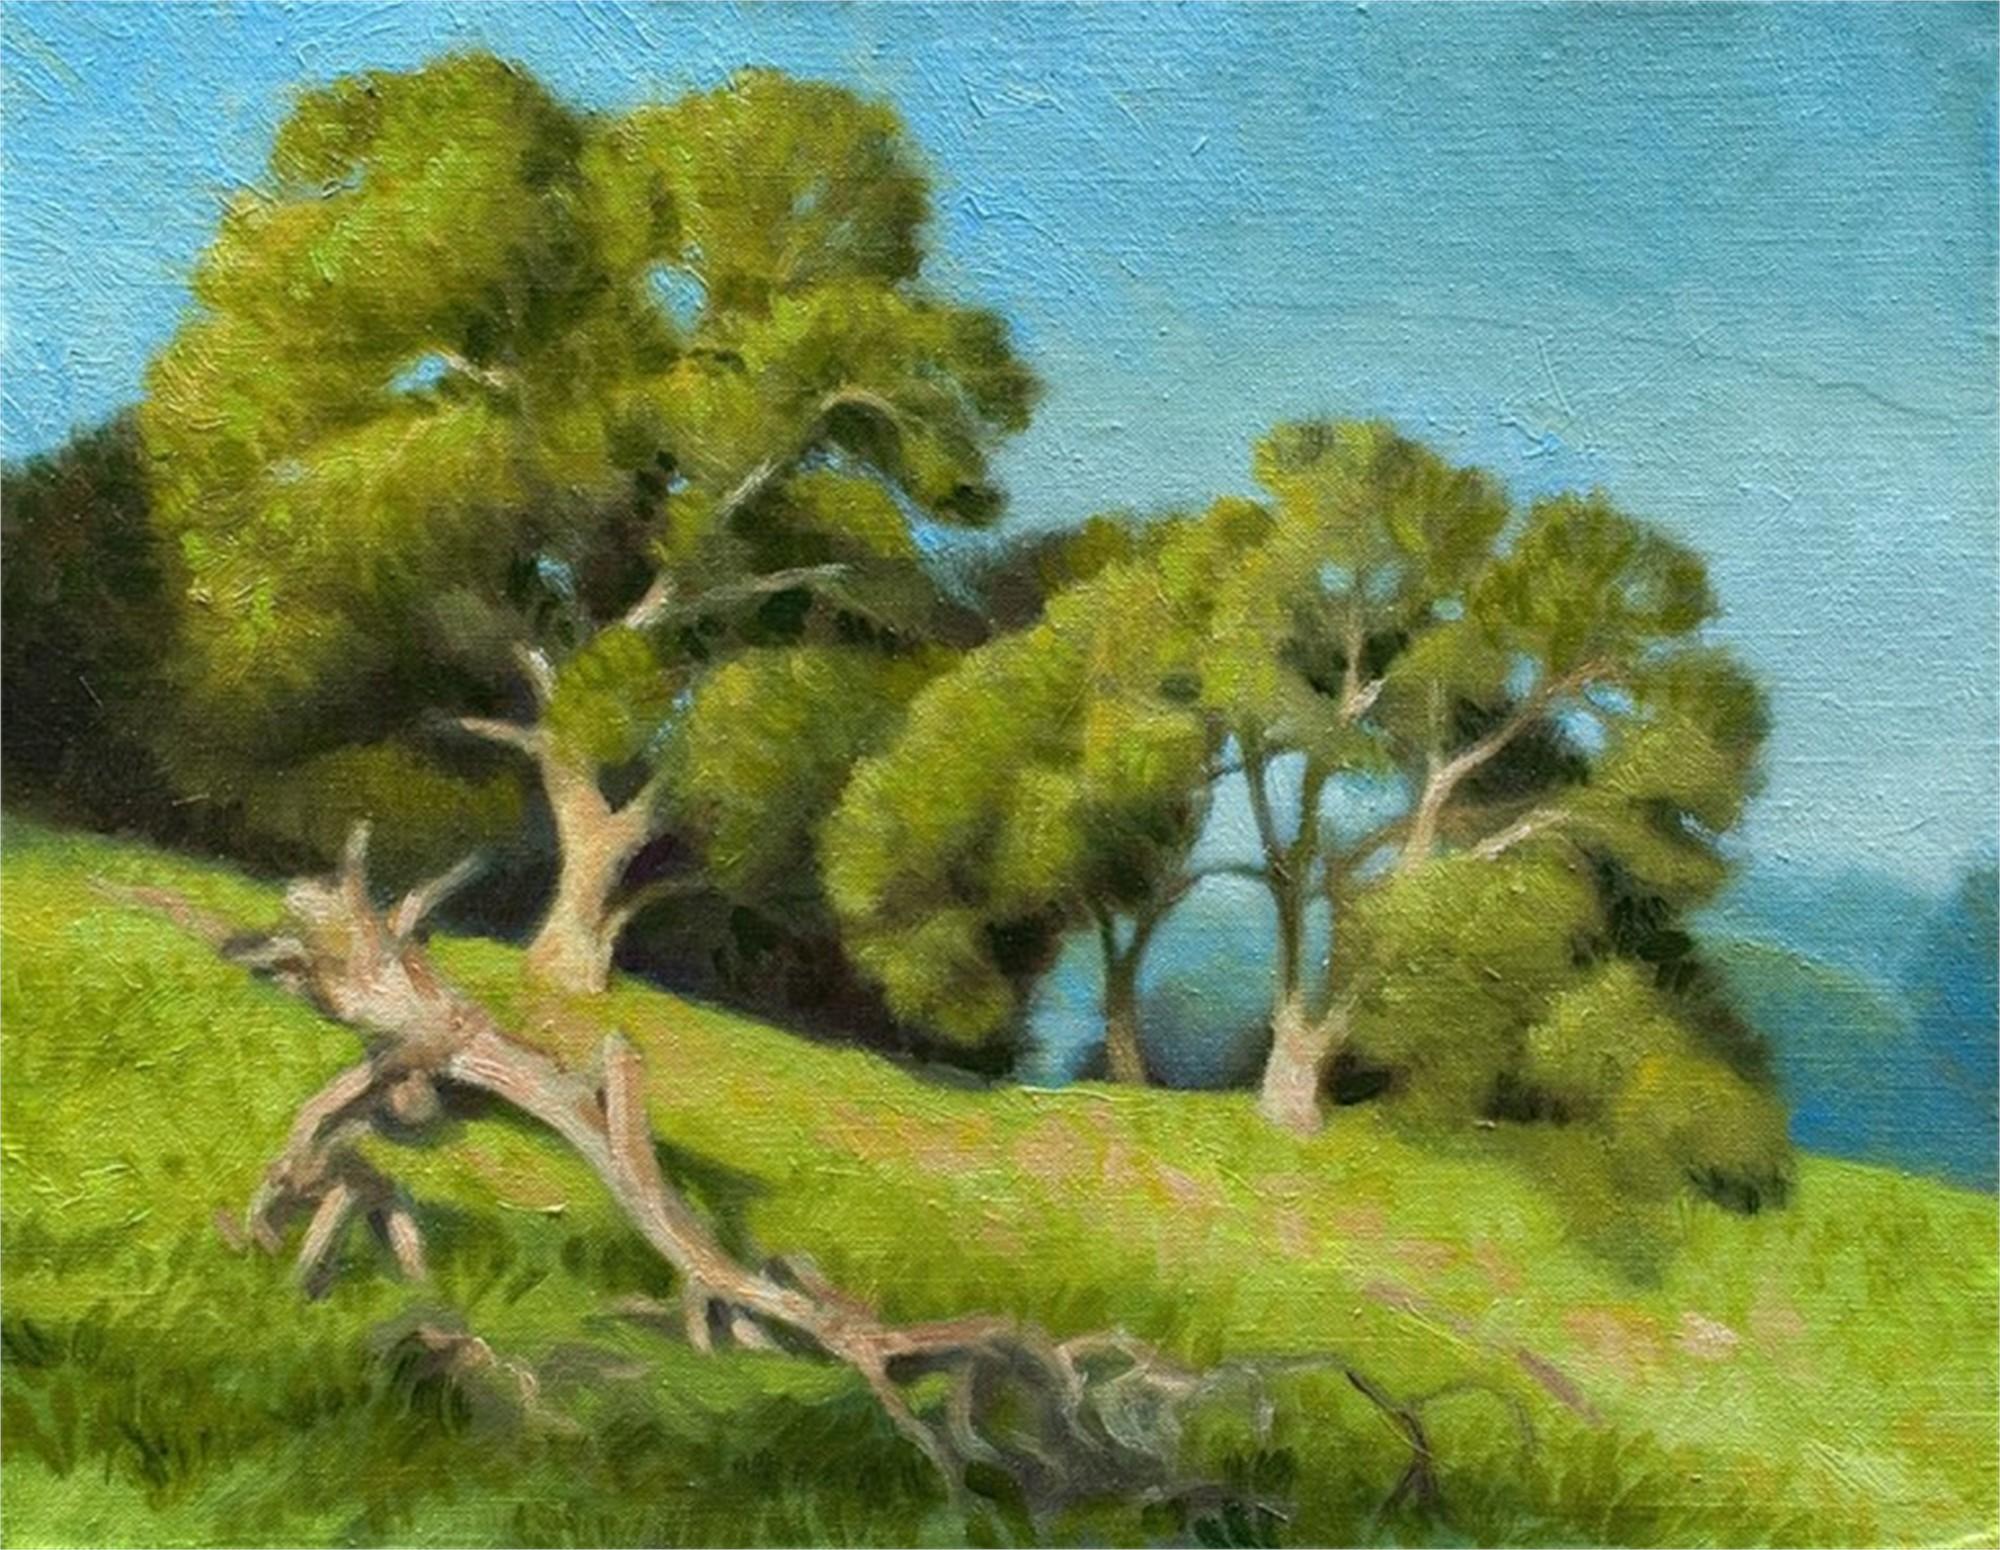 Oaks in Briones by Ocean Quigley